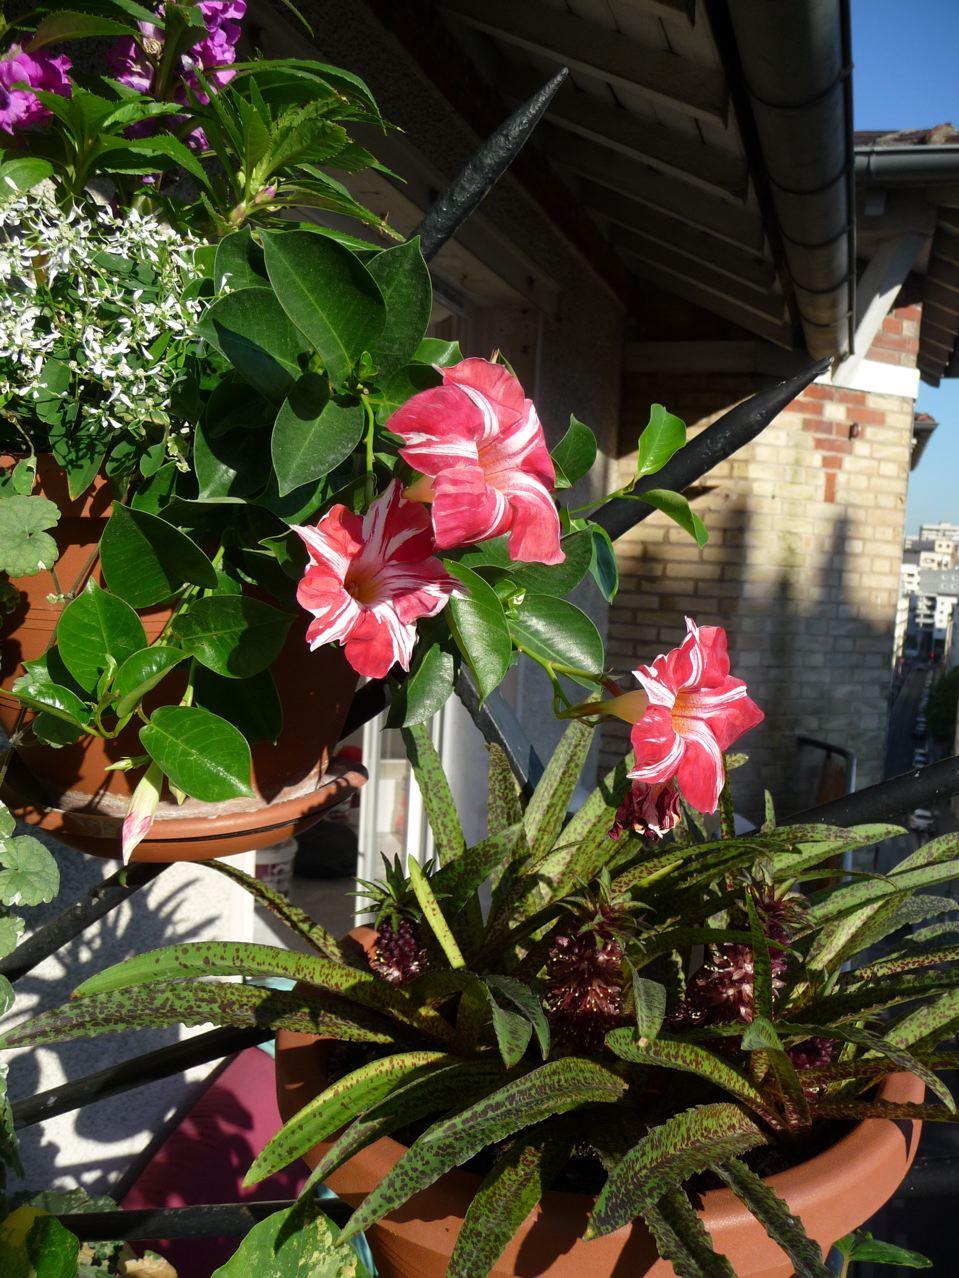 Plante exotique grimpante ou retombante